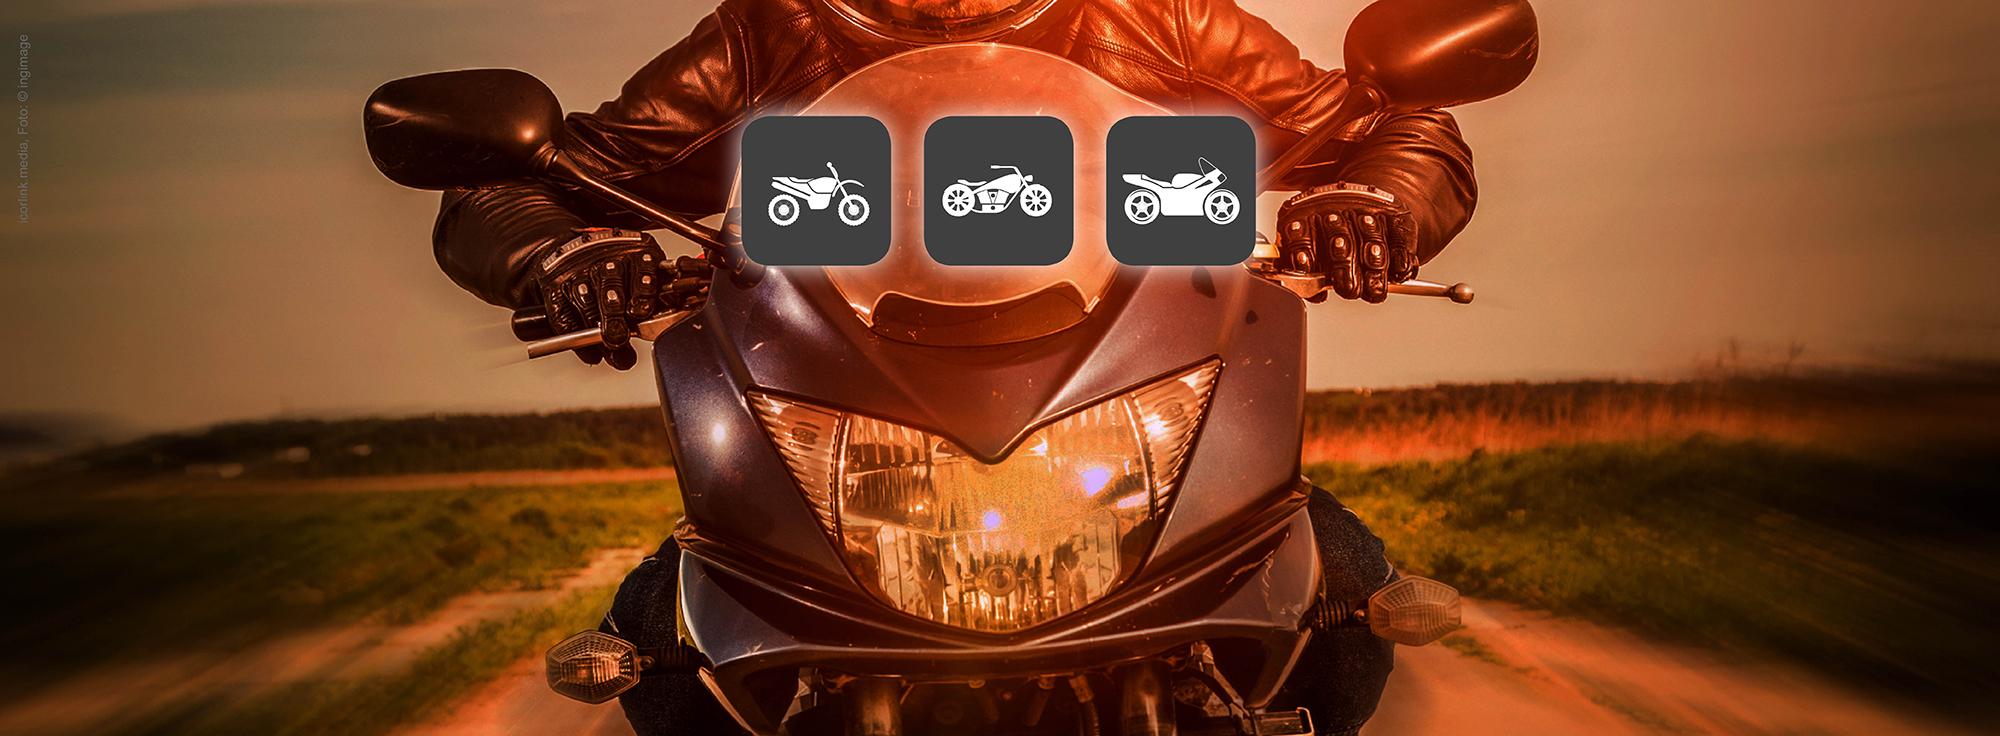 Roth_Motorrad_Webpageheader_2000x736ee